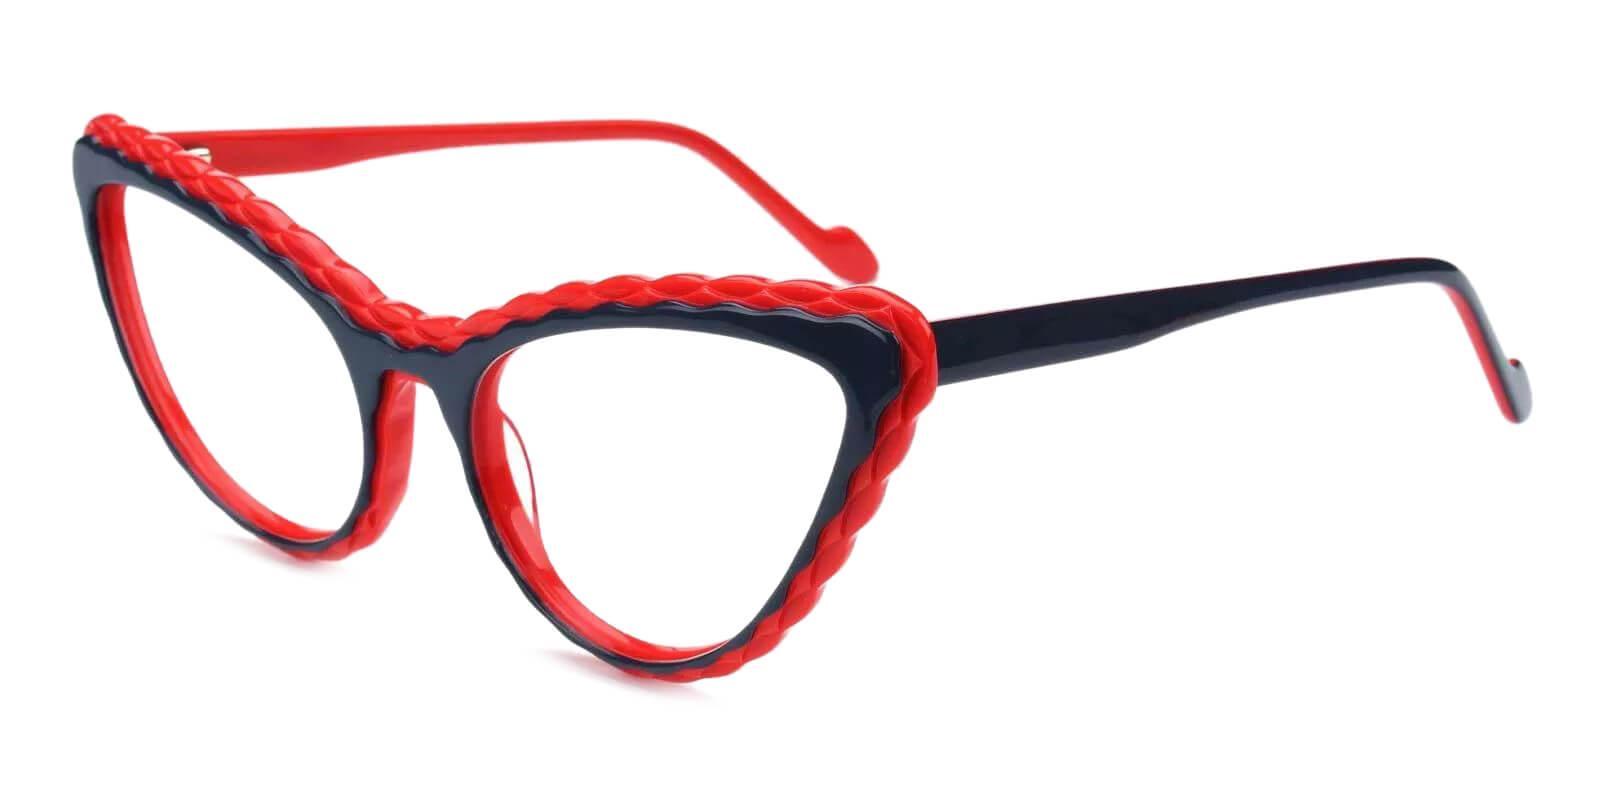 Harmt Red Acetate Eyeglasses , Fashion , SpringHinges , UniversalBridgeFit Frames from ABBE Glasses